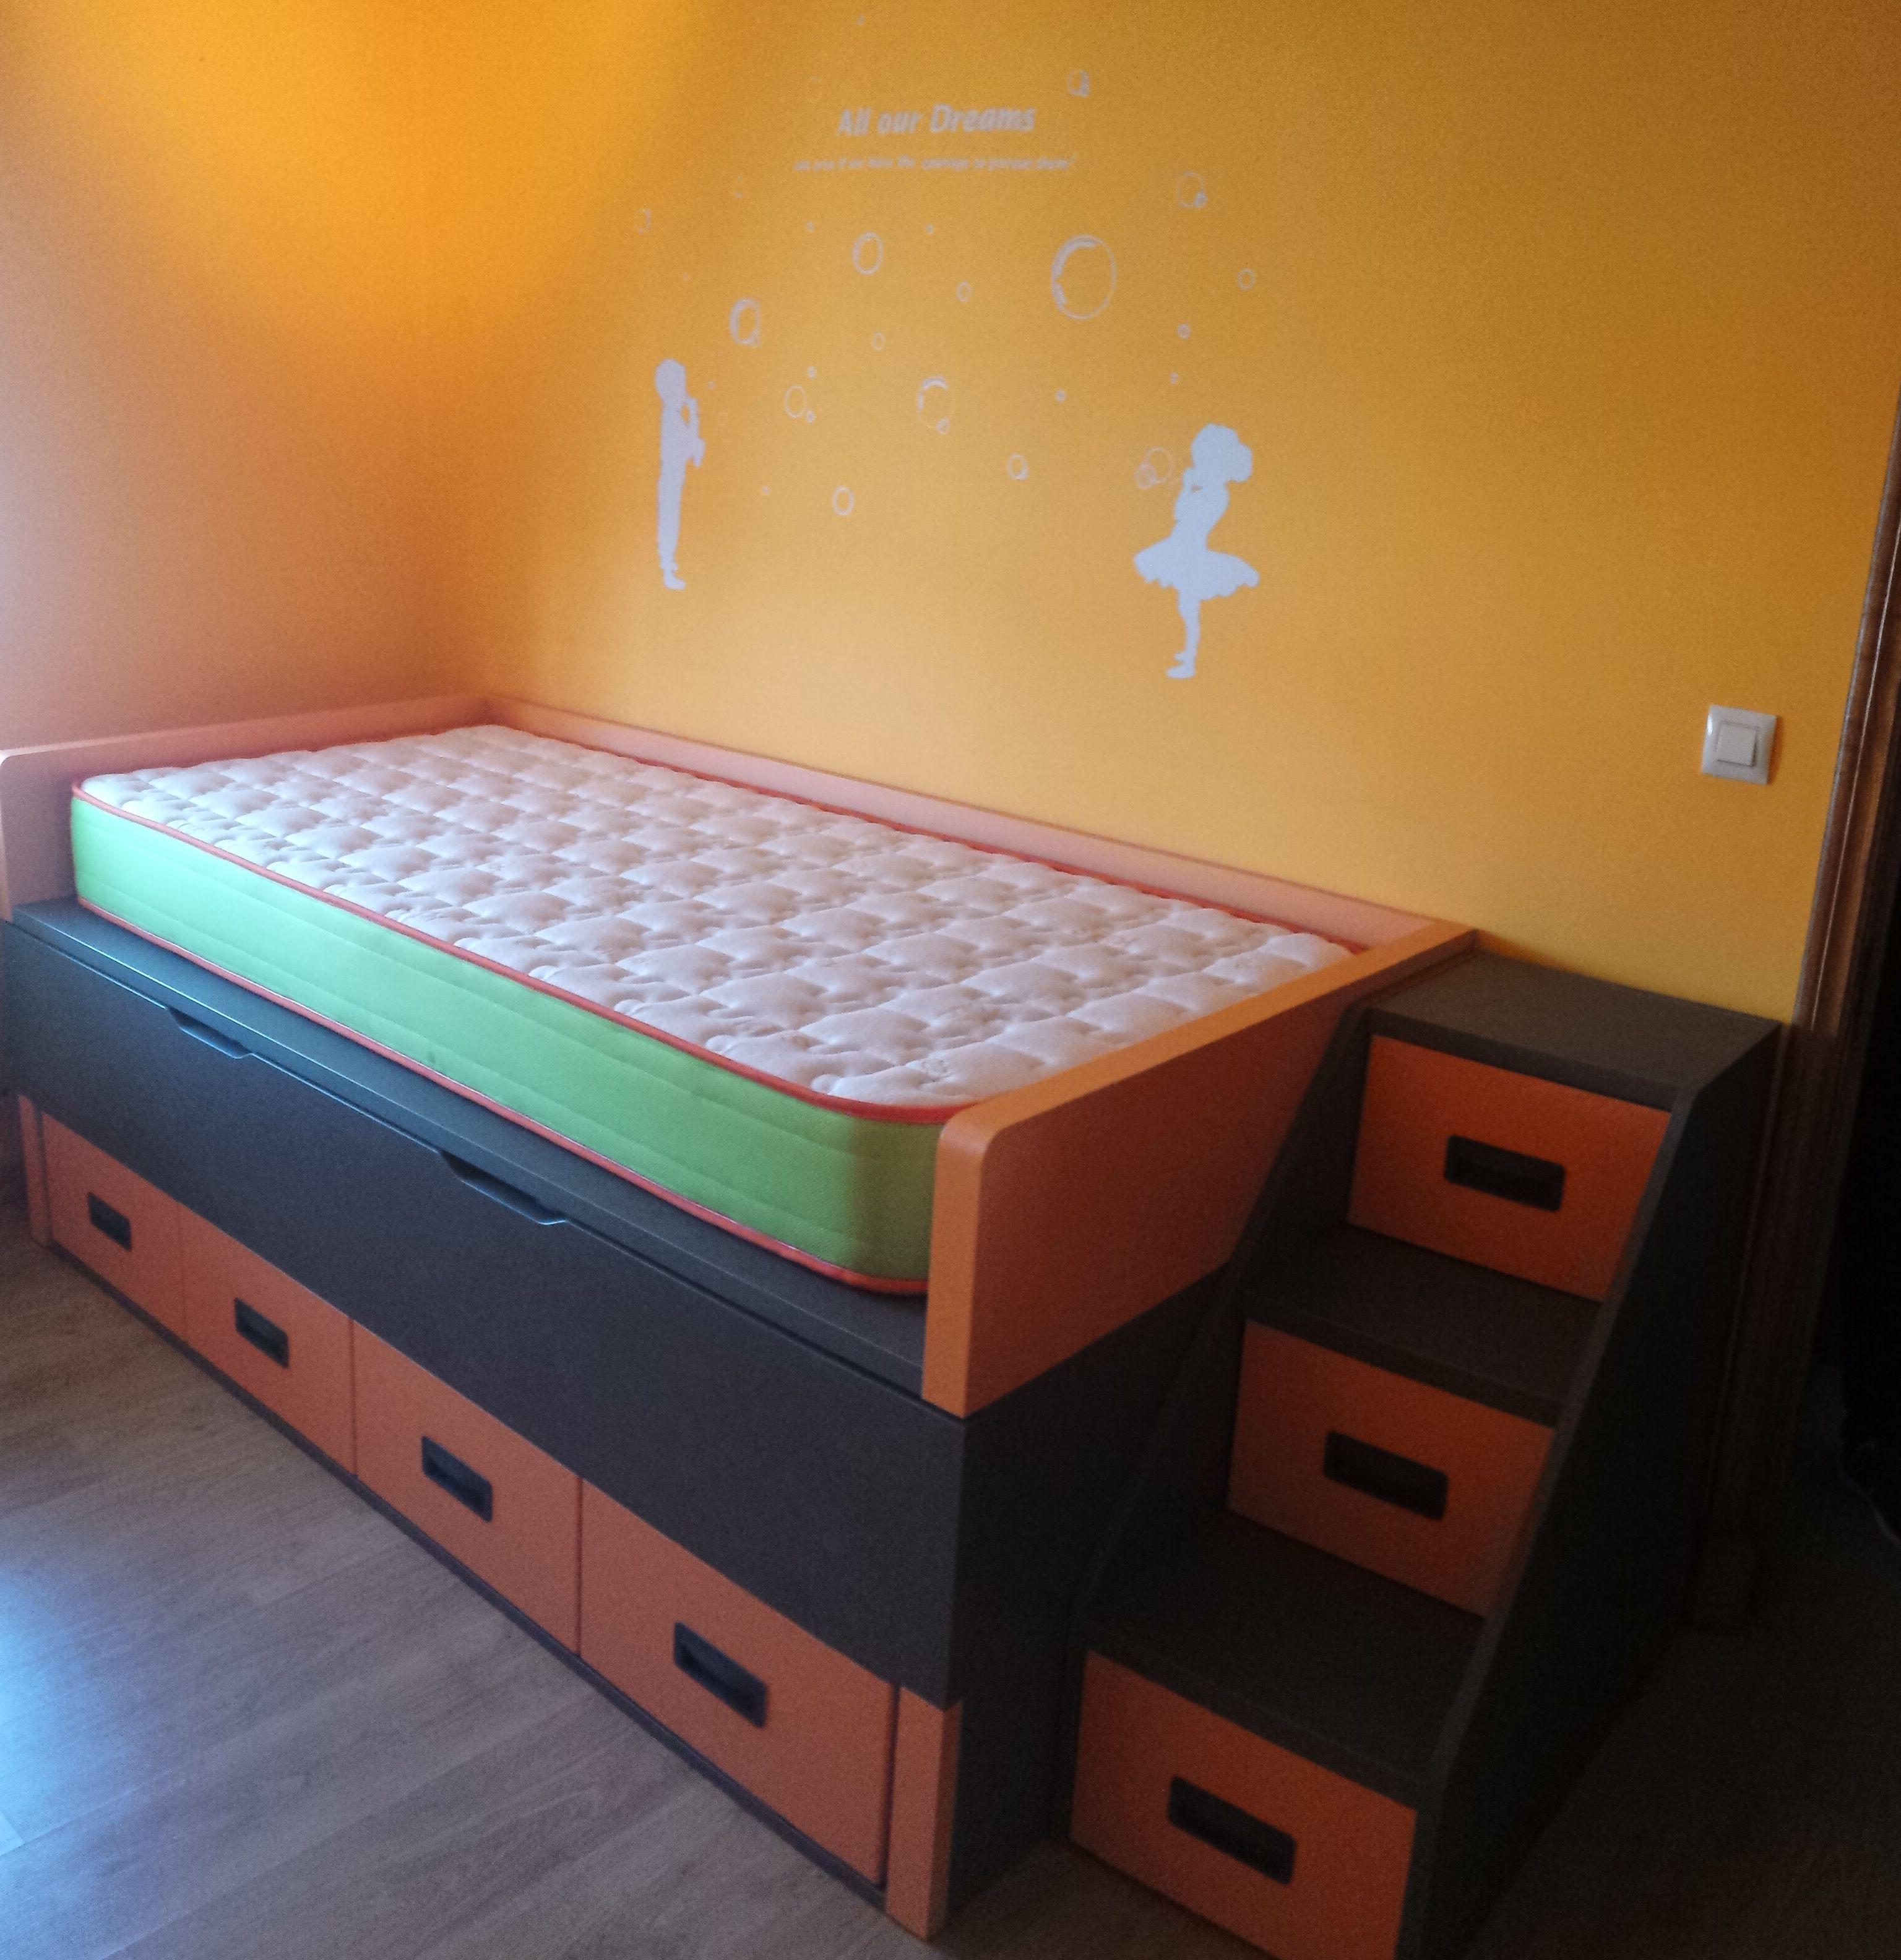 Compacto 2 camas de 90x190 + 4 contenedores. Escalera 1 contenedor